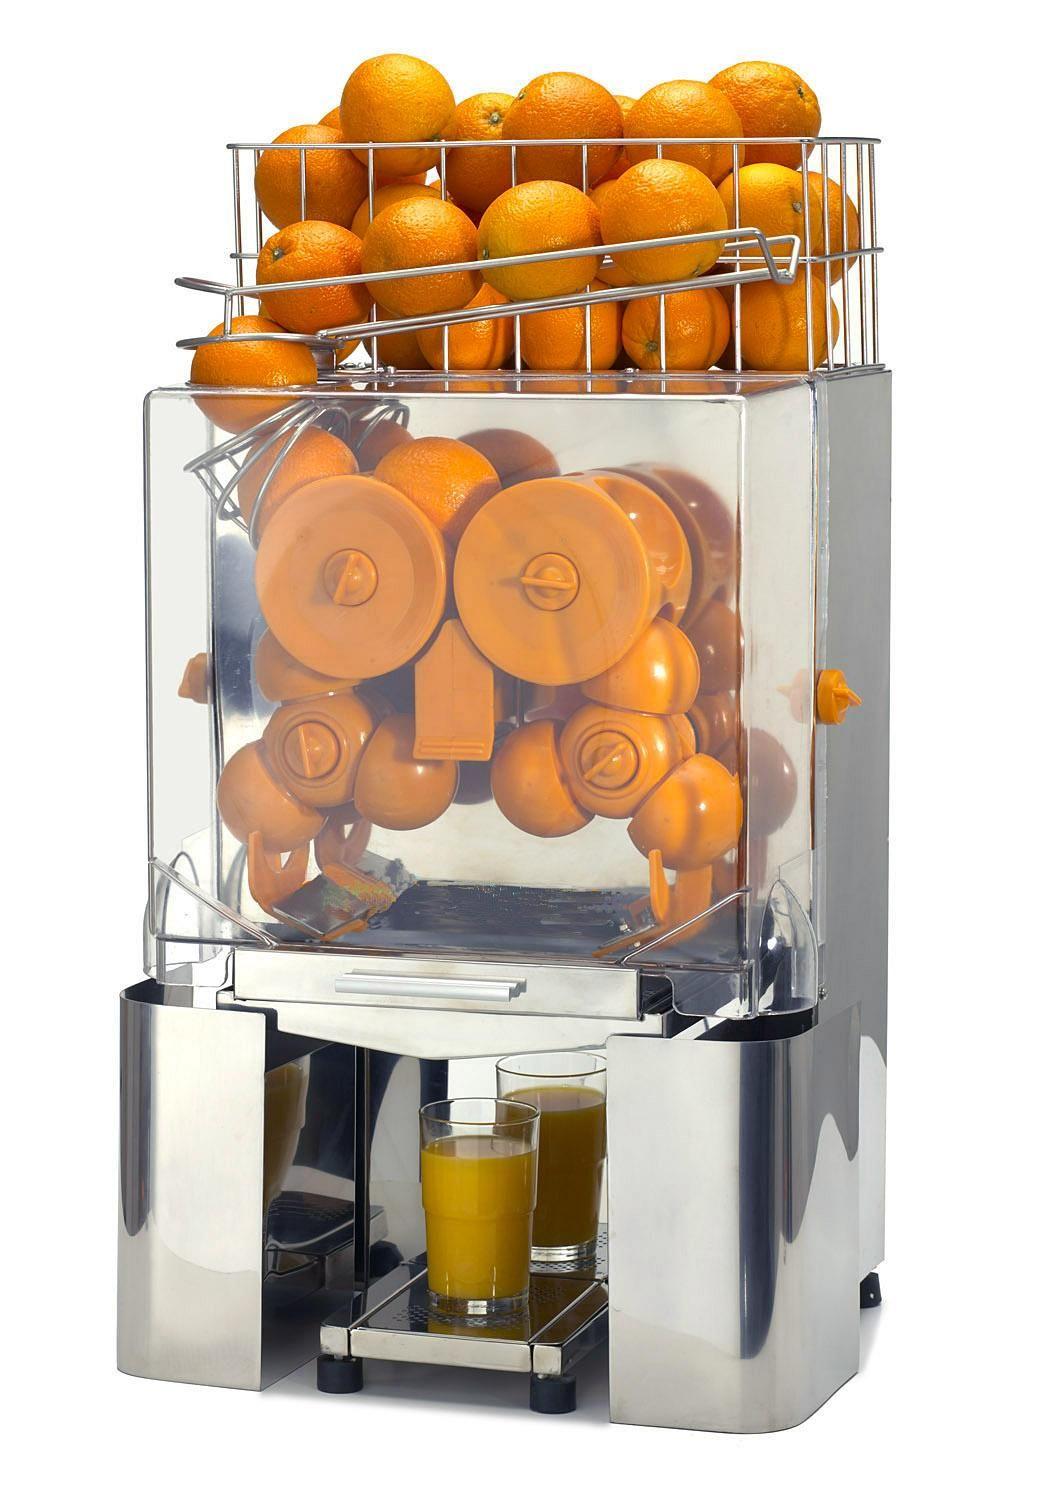 A professional orange juicer nice juicer machine